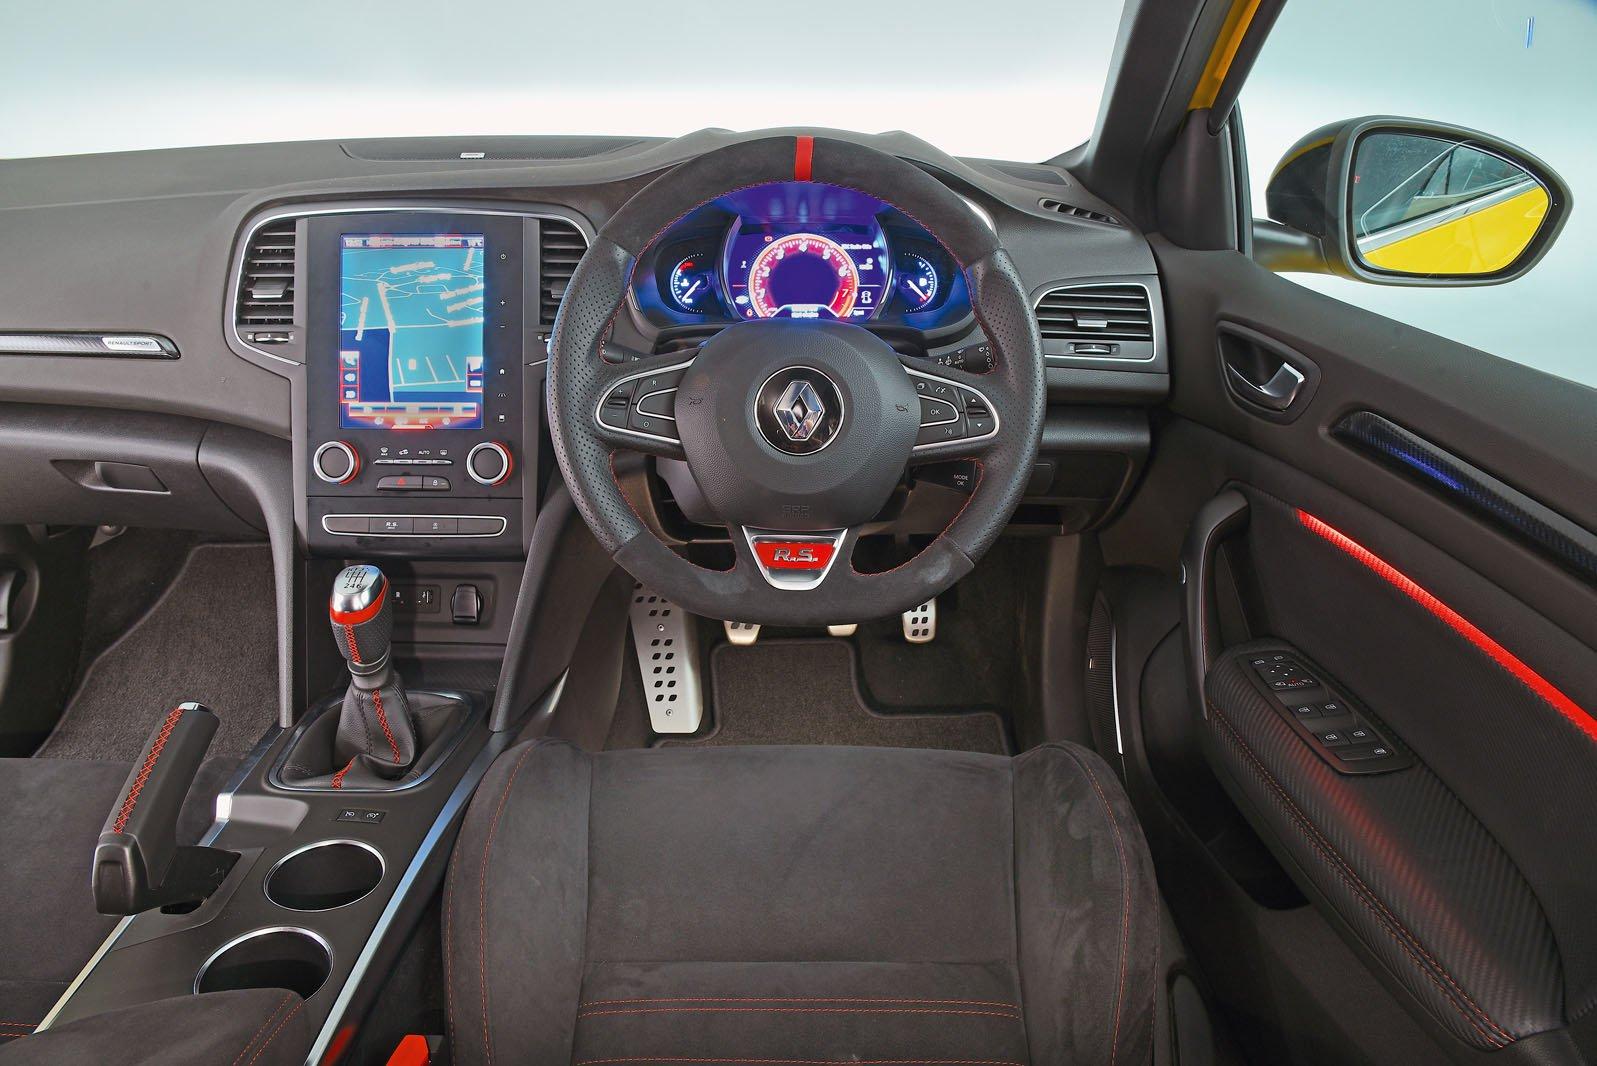 Renault Megane RS interior